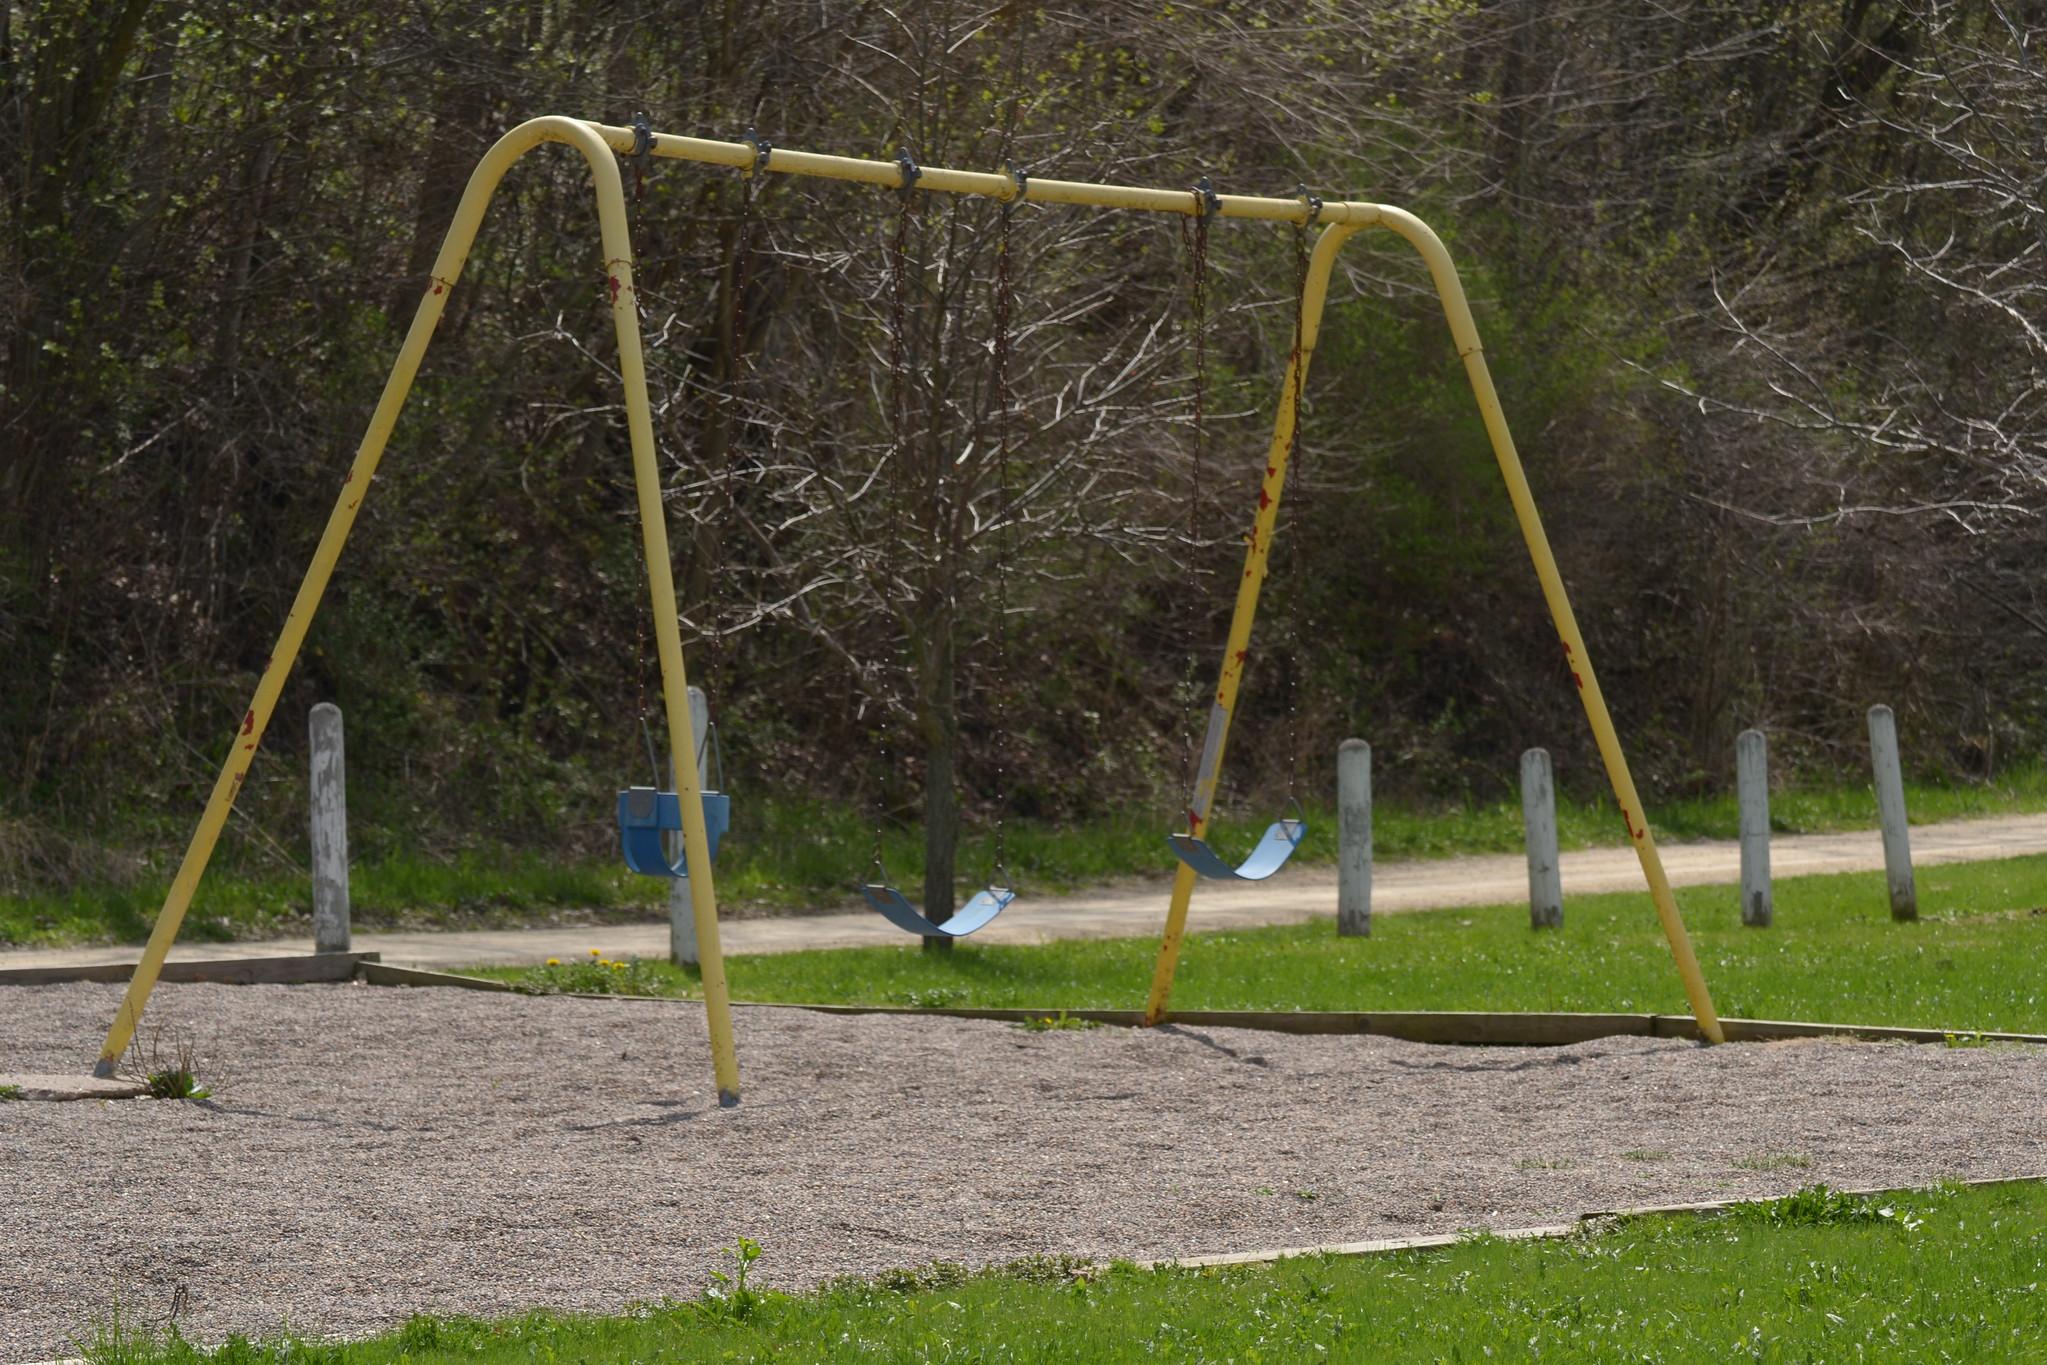 vintage swing set | Flickr - Photo Sharing!